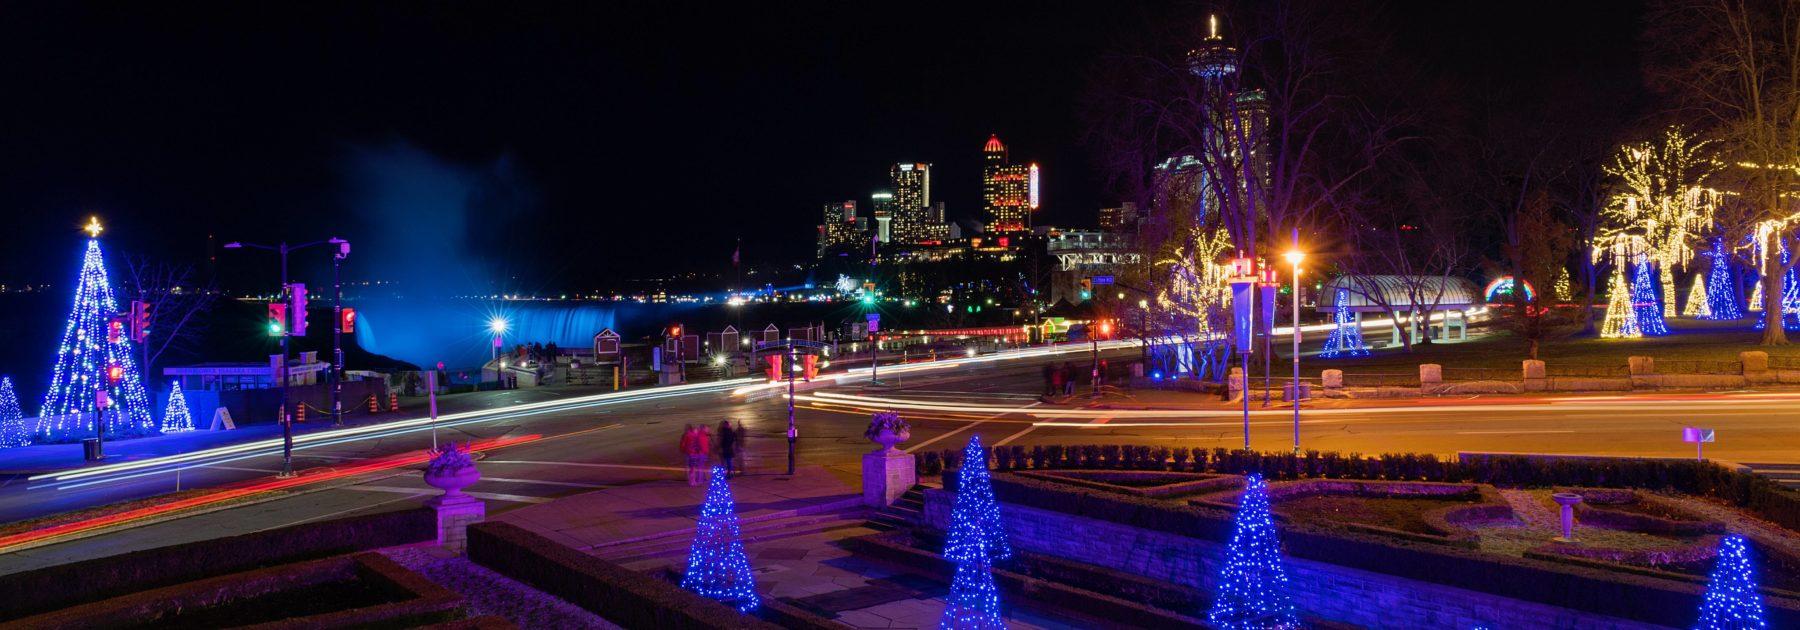 View of Niagara Parkway